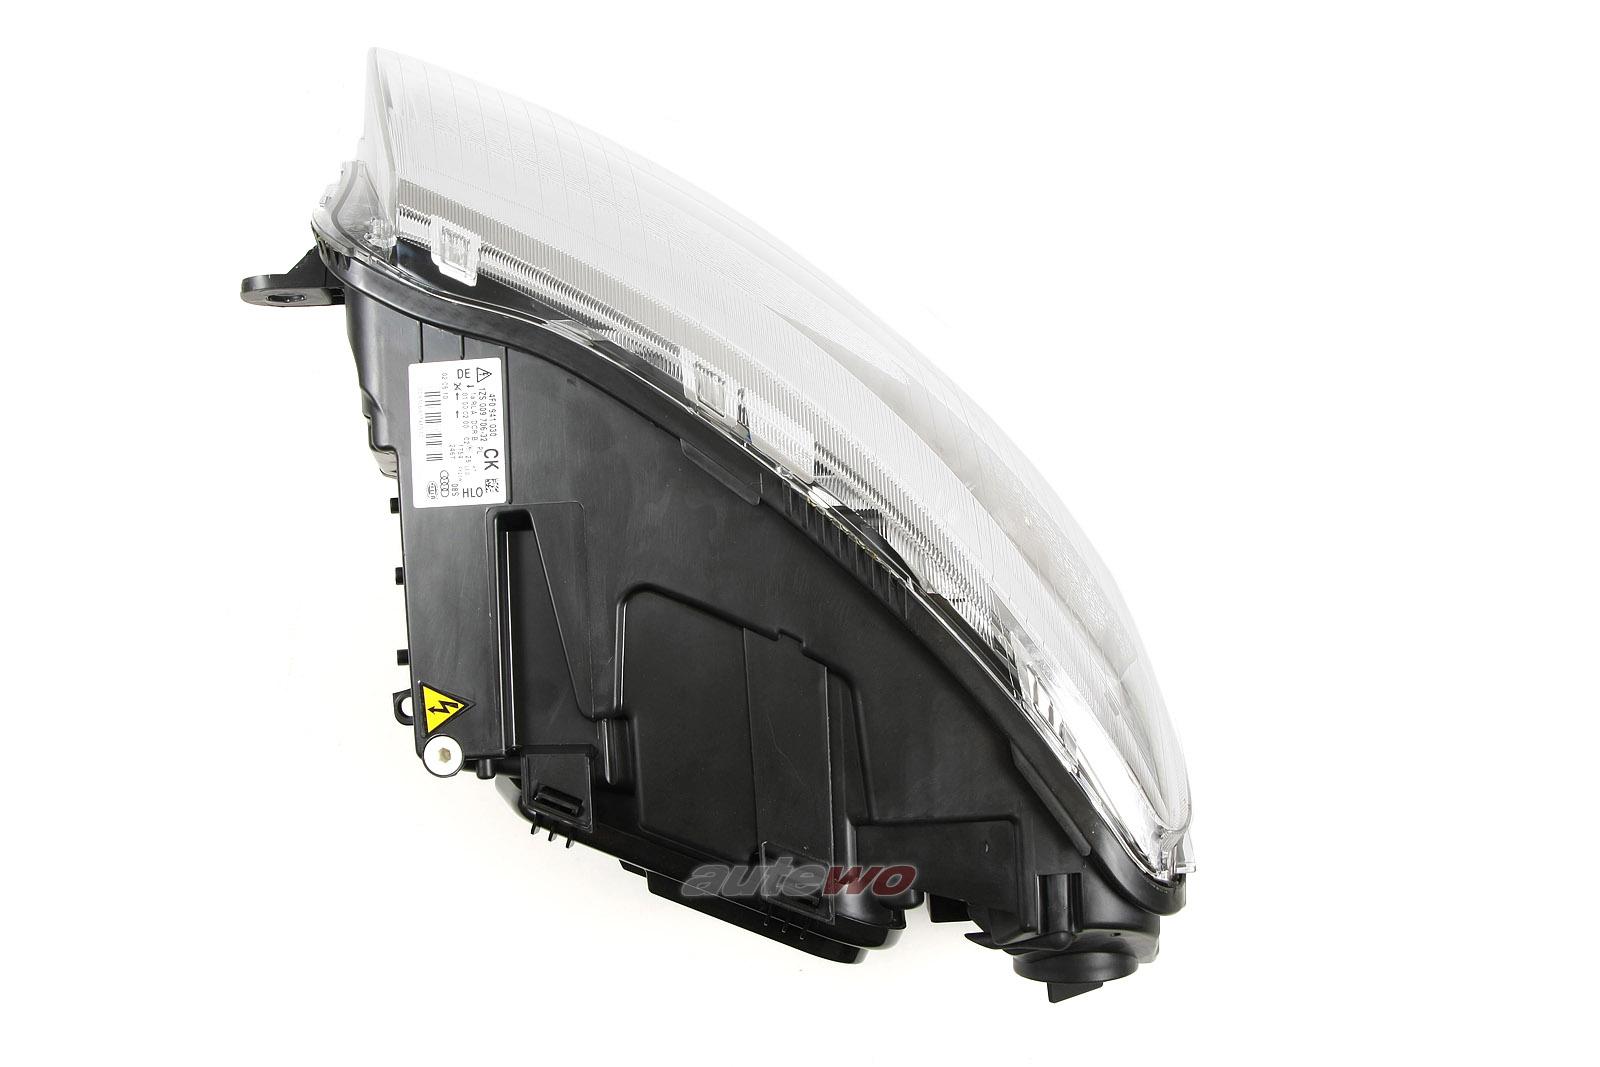 4f0941030ck neu audi rs6 4f bixenon scheinwerfer led rechts. Black Bedroom Furniture Sets. Home Design Ideas